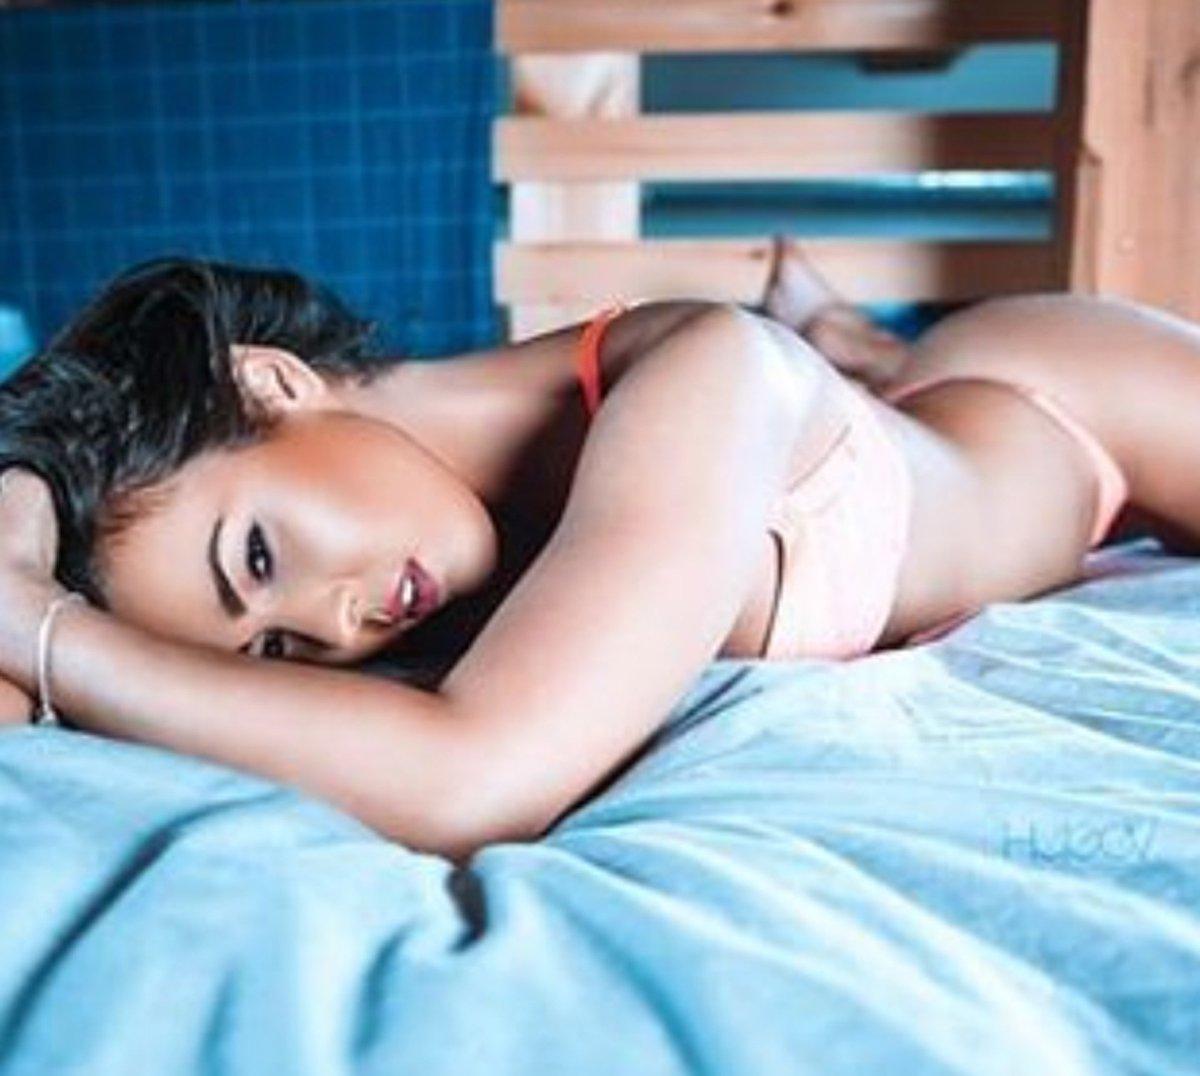 bra XXX Belen Bergagna naked photo 2017